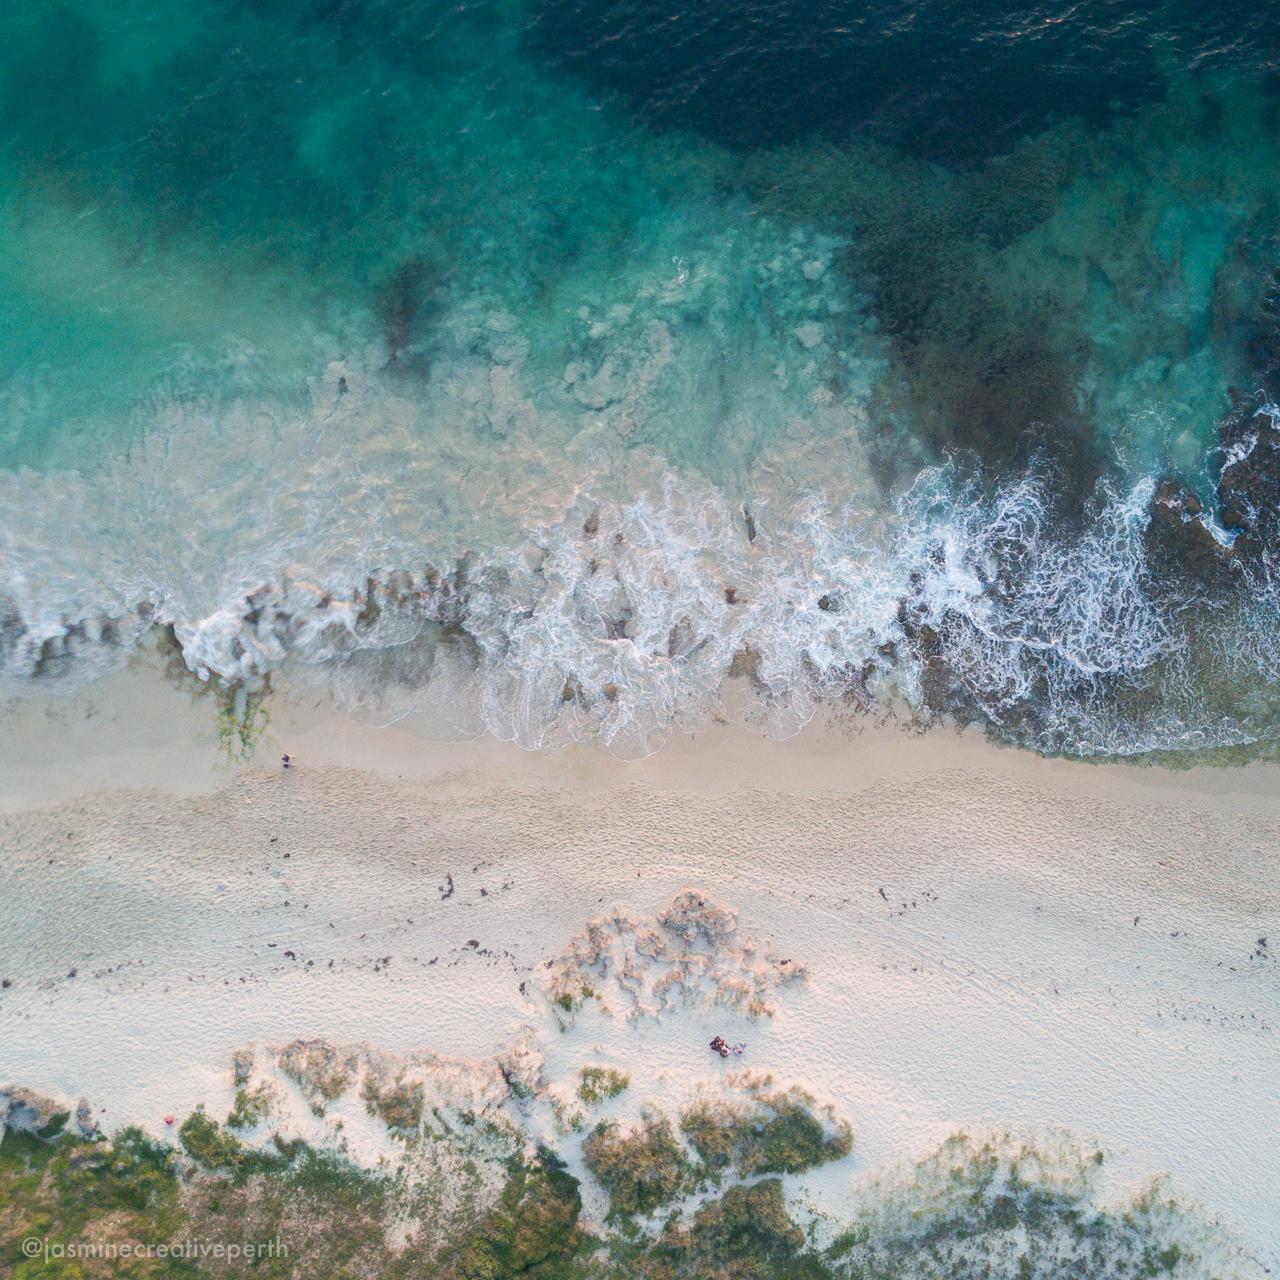 perth beach ocean aerial landscape photography jasmine creative body perth (5 of 11).jpg